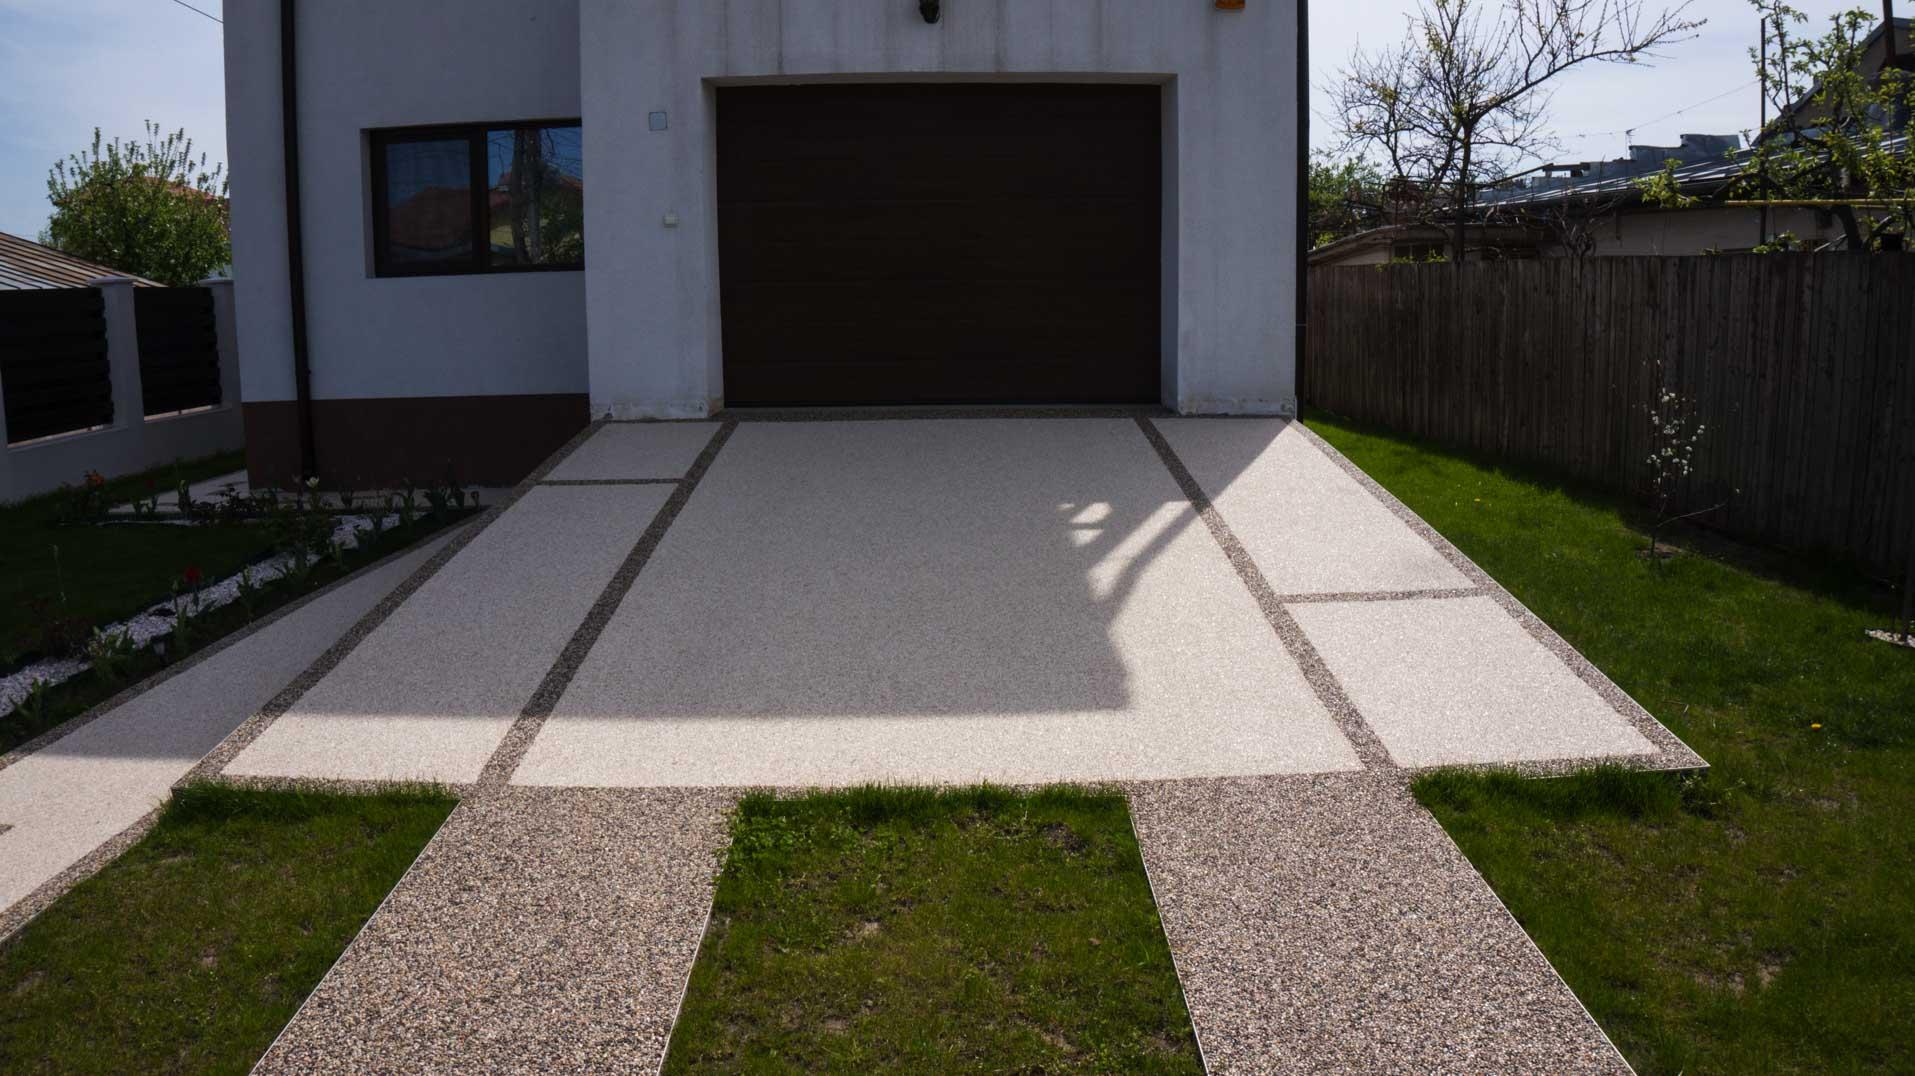 viarustik-stone-carpet-car-acces